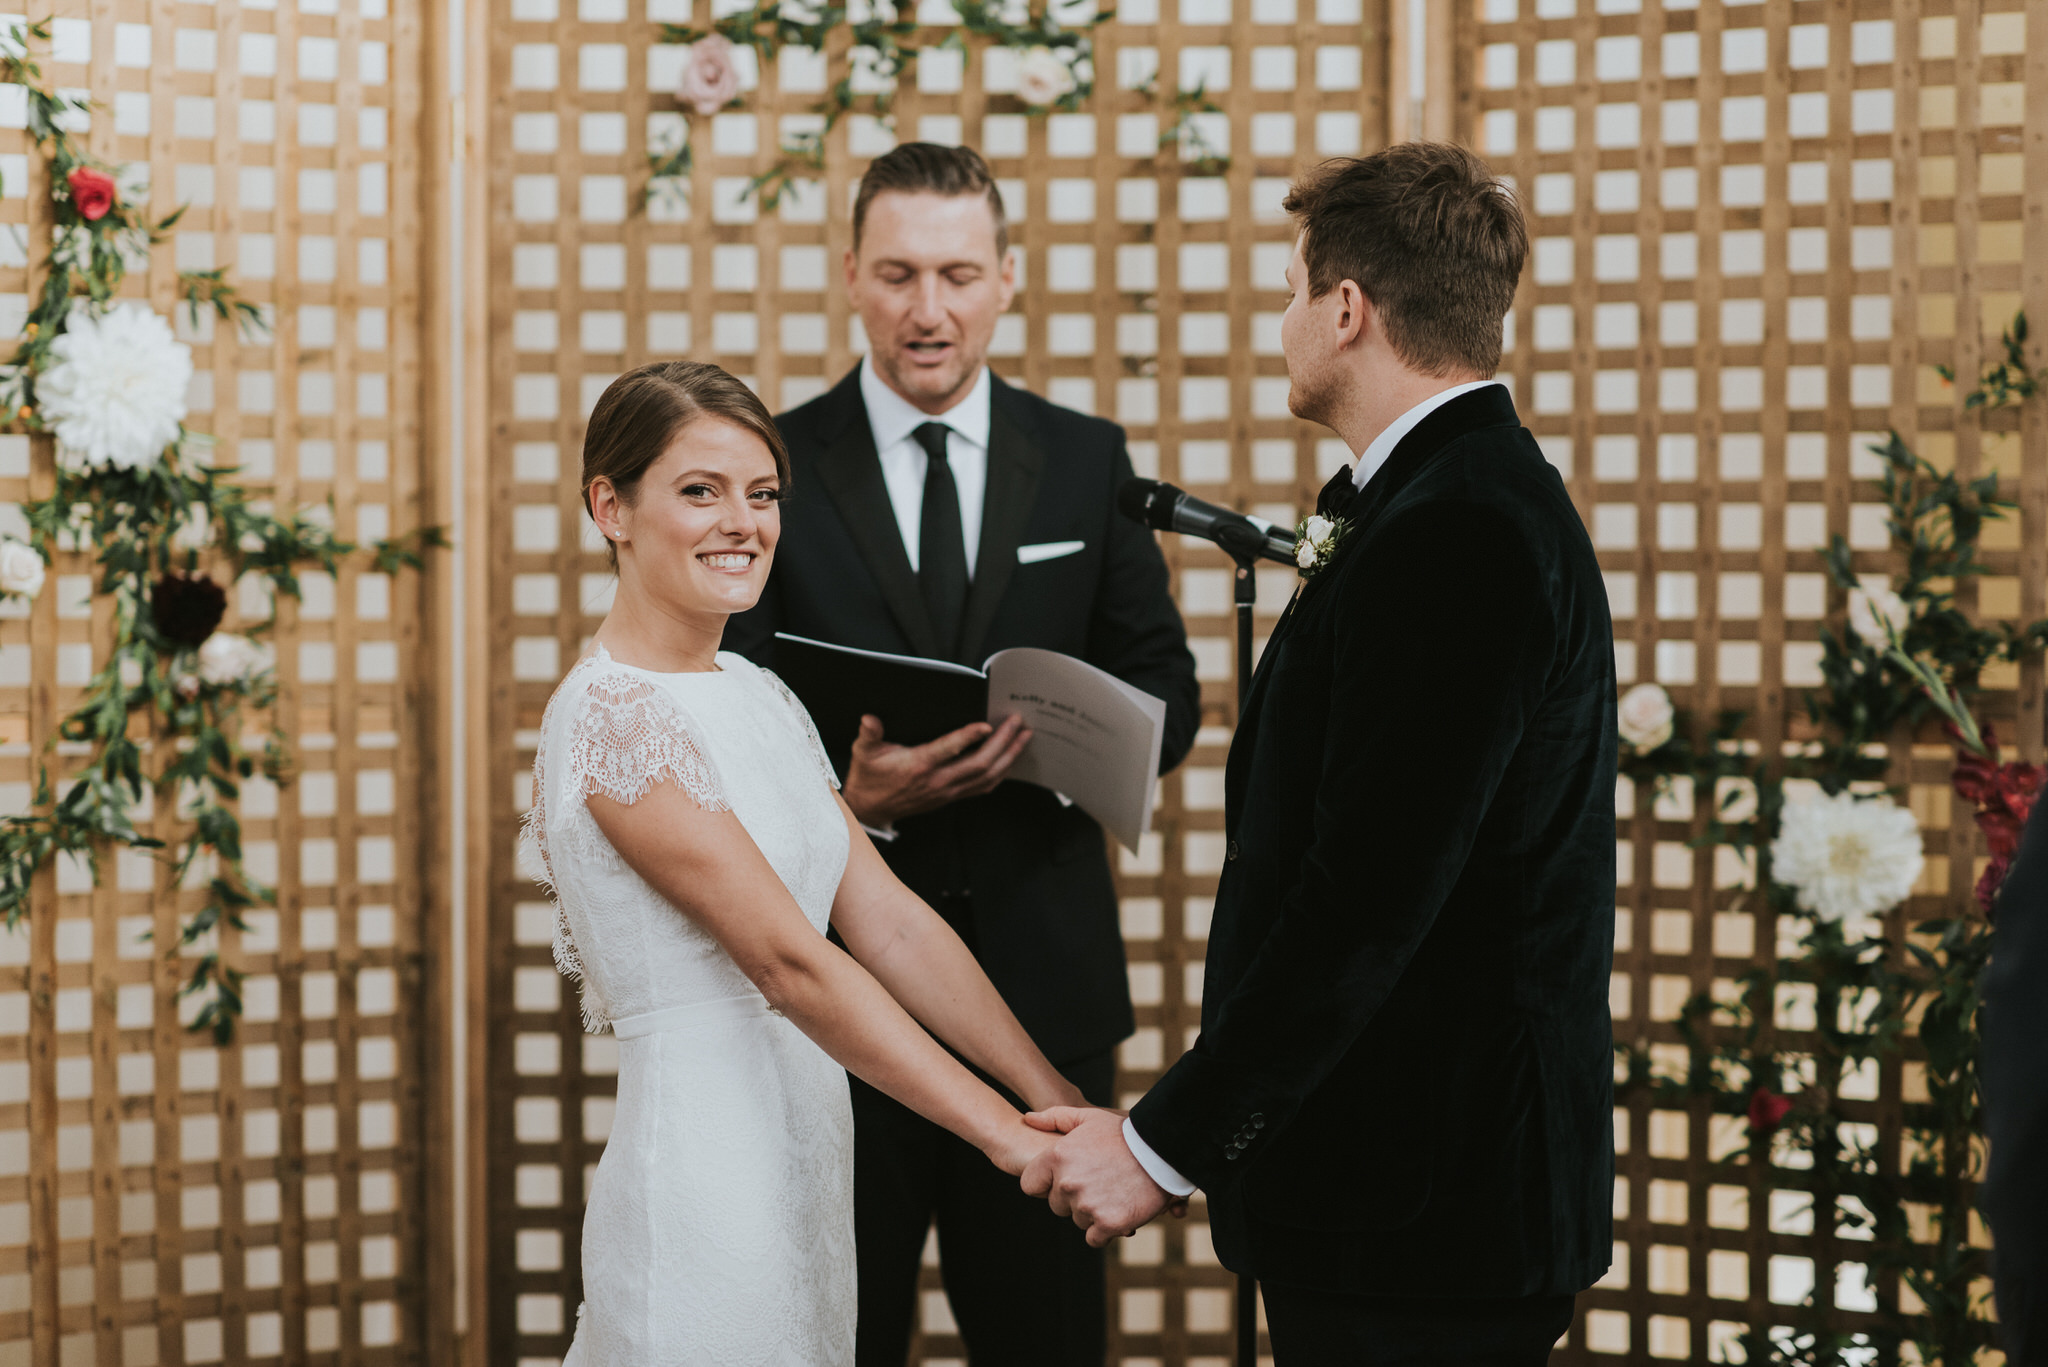 scarletoneillphotography_weddingphotography_prince edward county weddings113.JPG